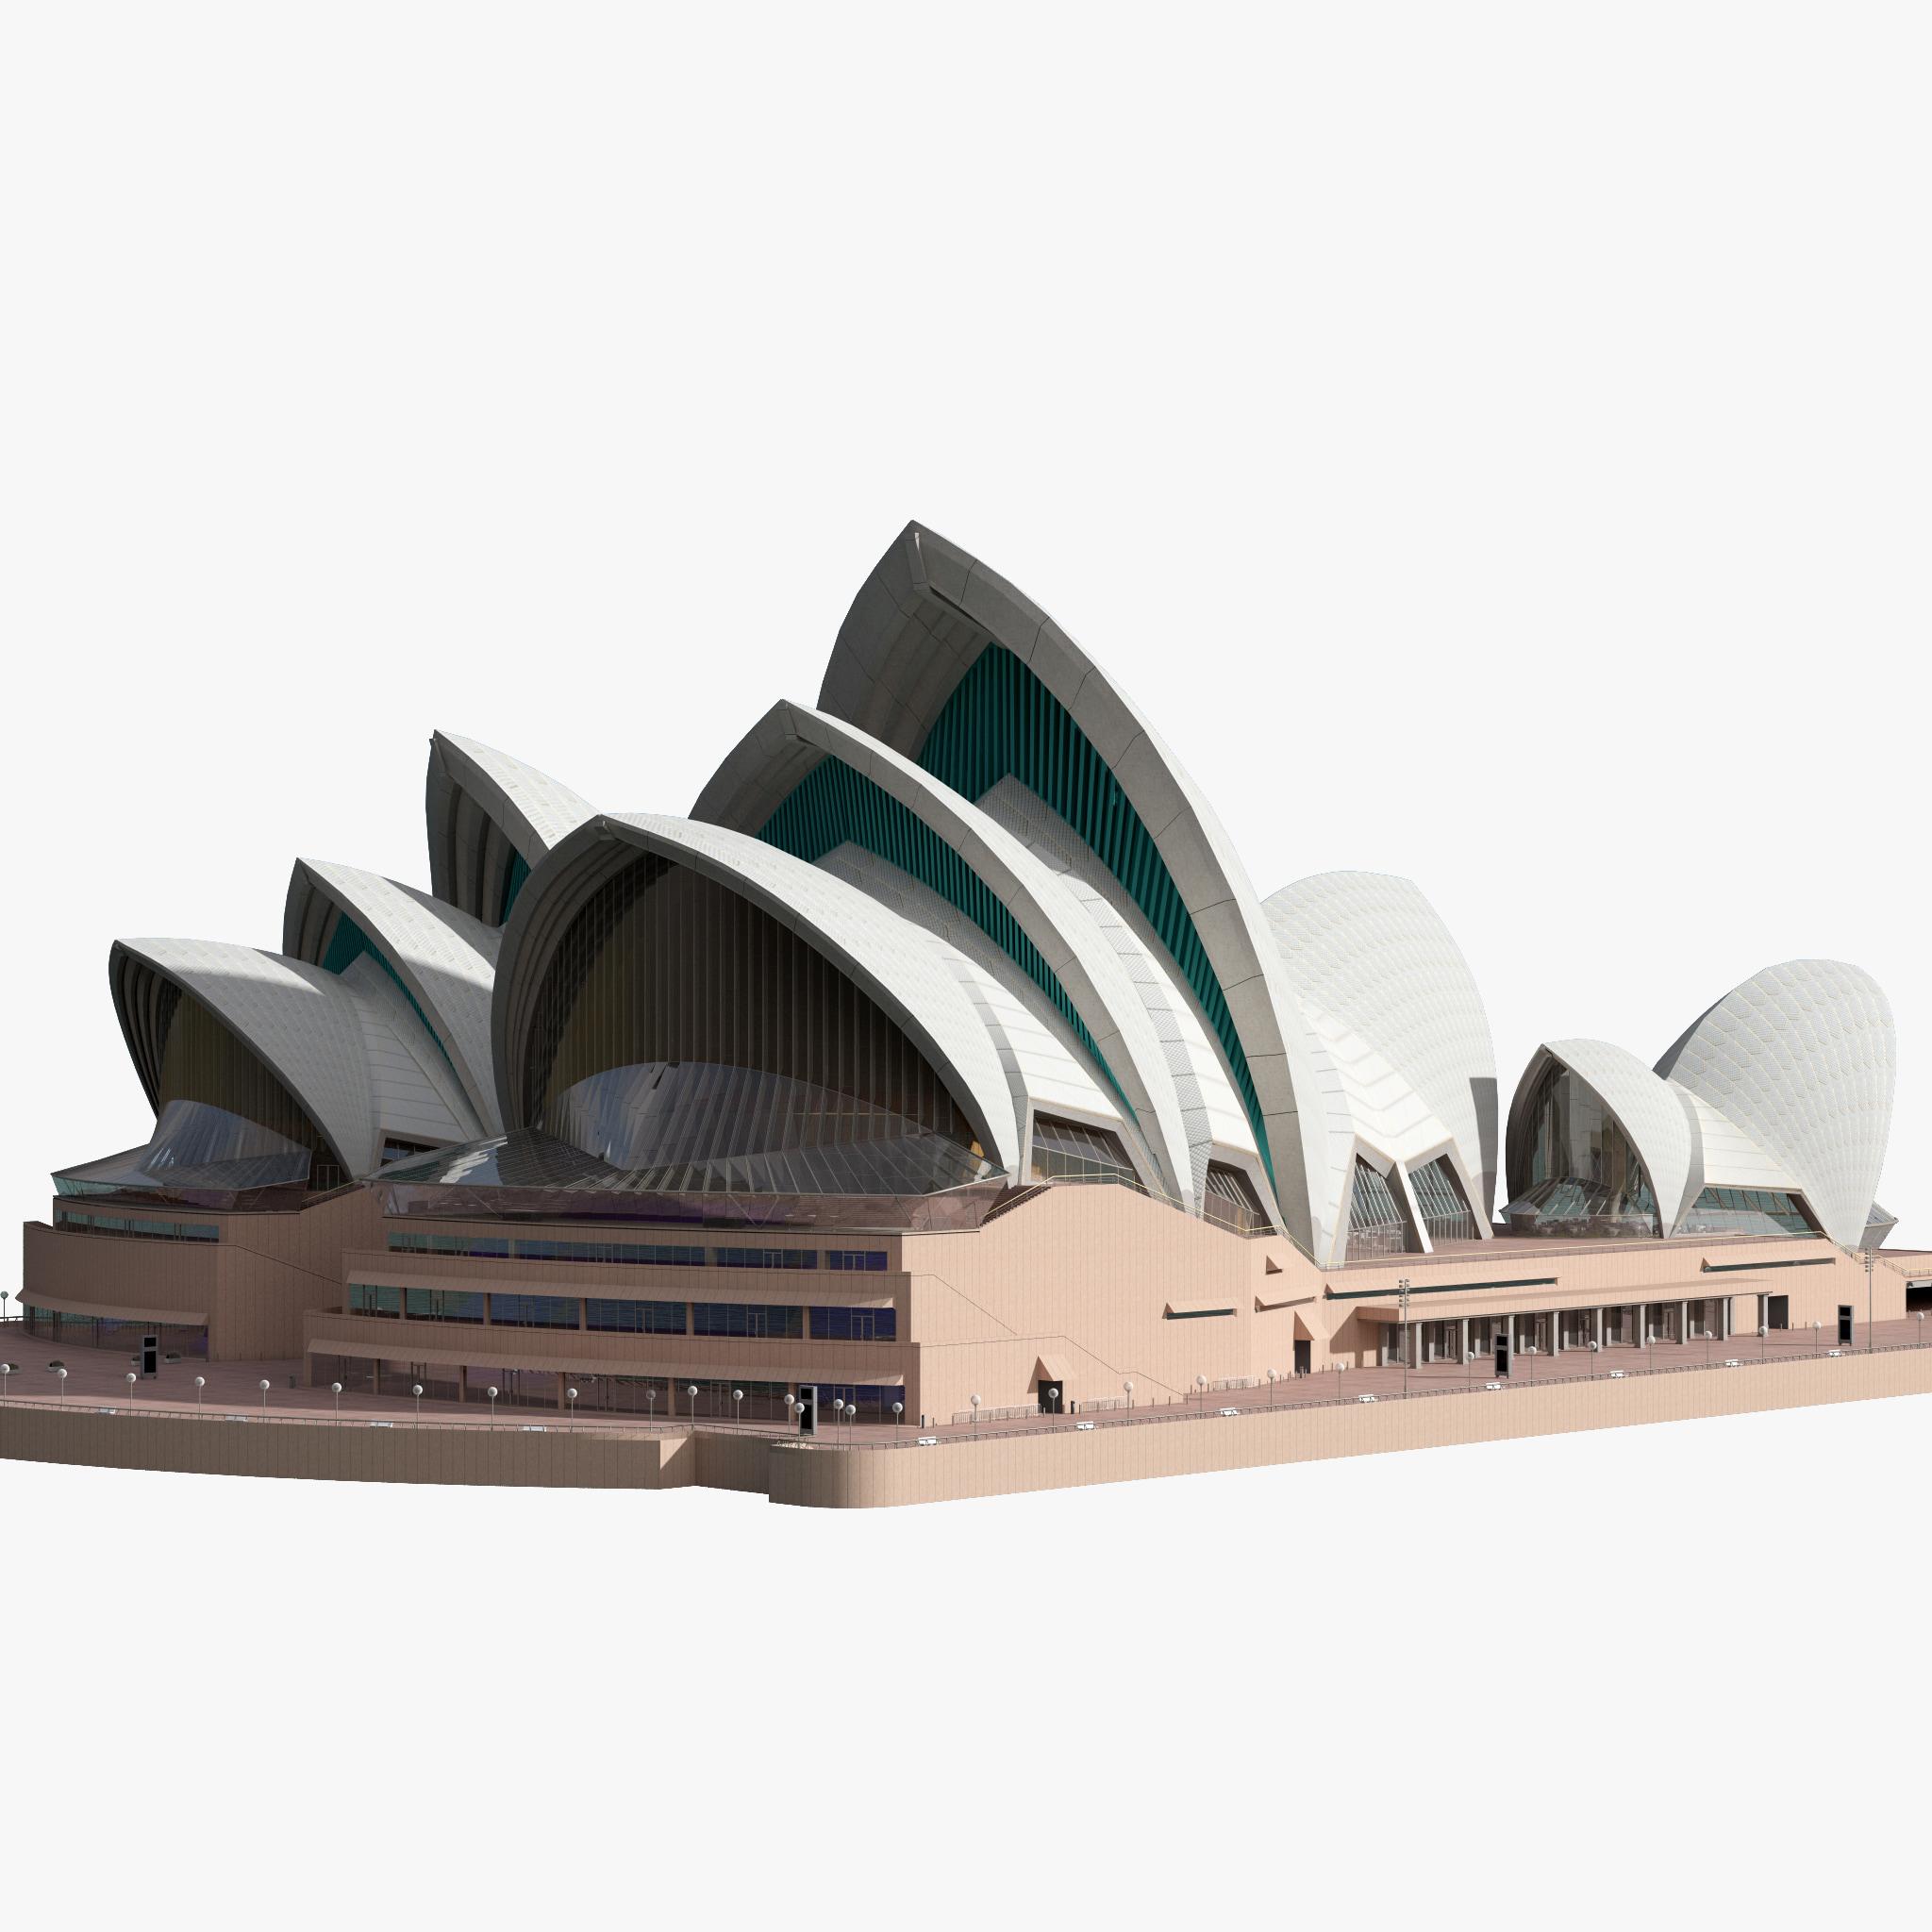 Png Sydney Opera House - 3D Model Sydney Opera House, Transparent background PNG HD thumbnail